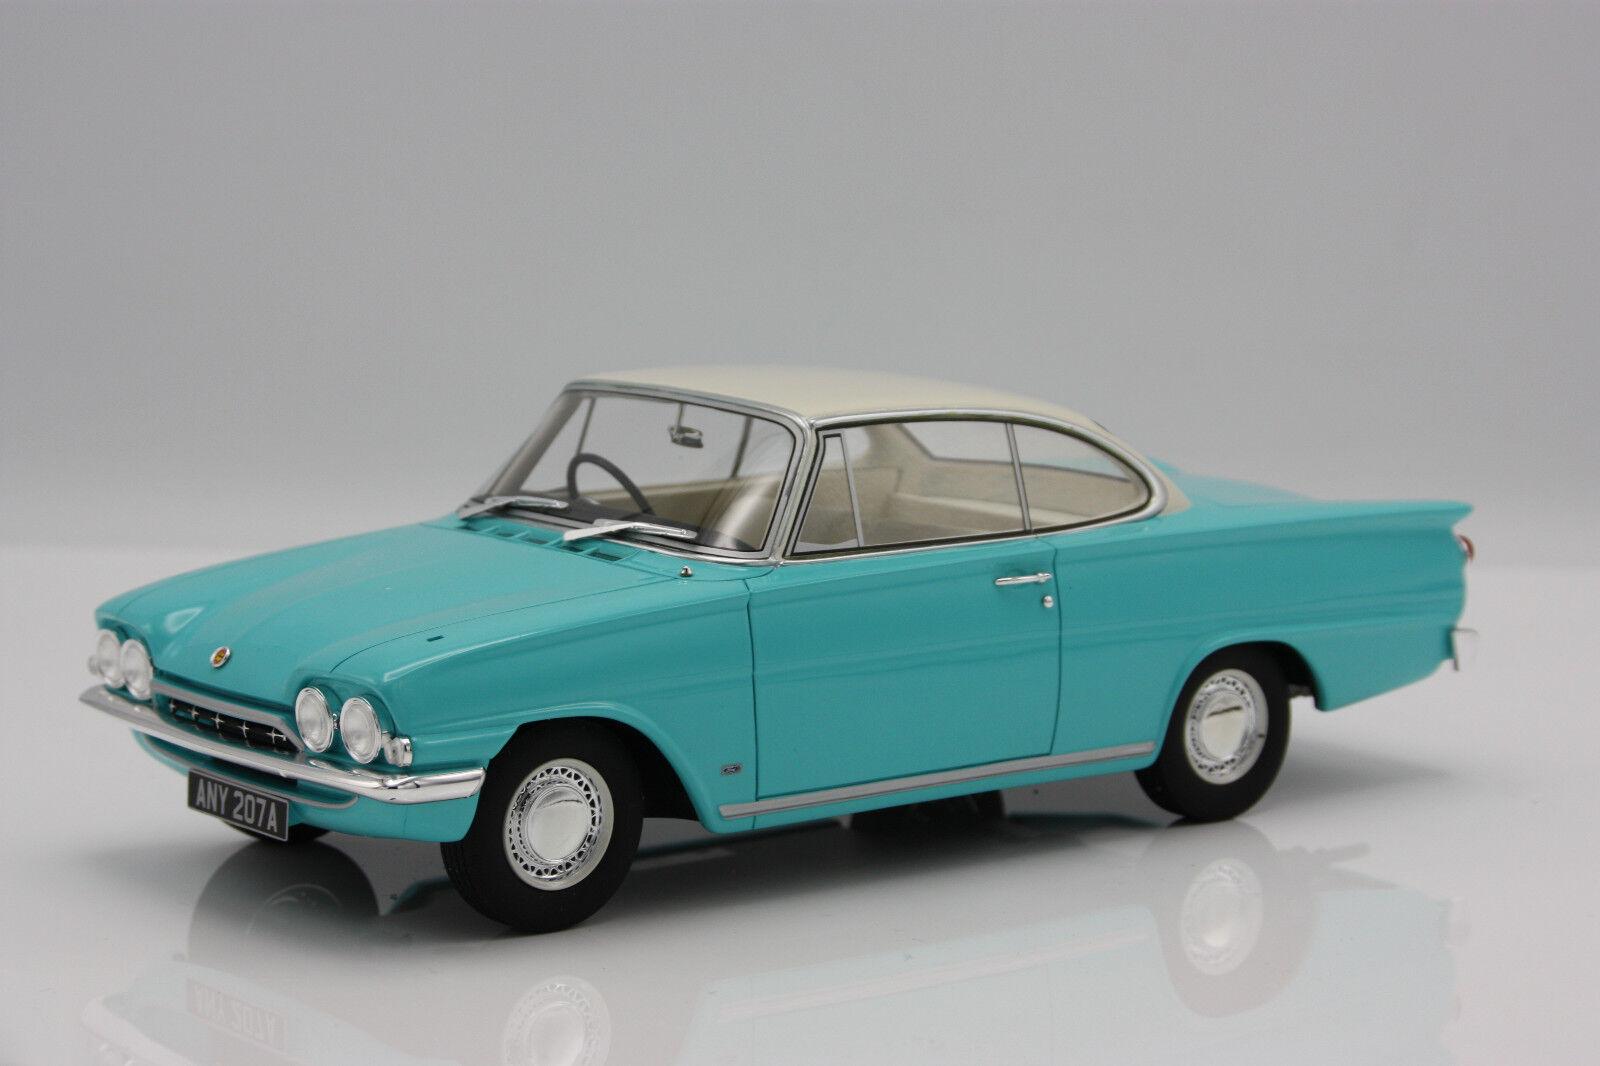 Ford Consul Capri 116E GT RHD 1963 Turquoise blanc  1 18 BOS    nouveau   meilleure vente